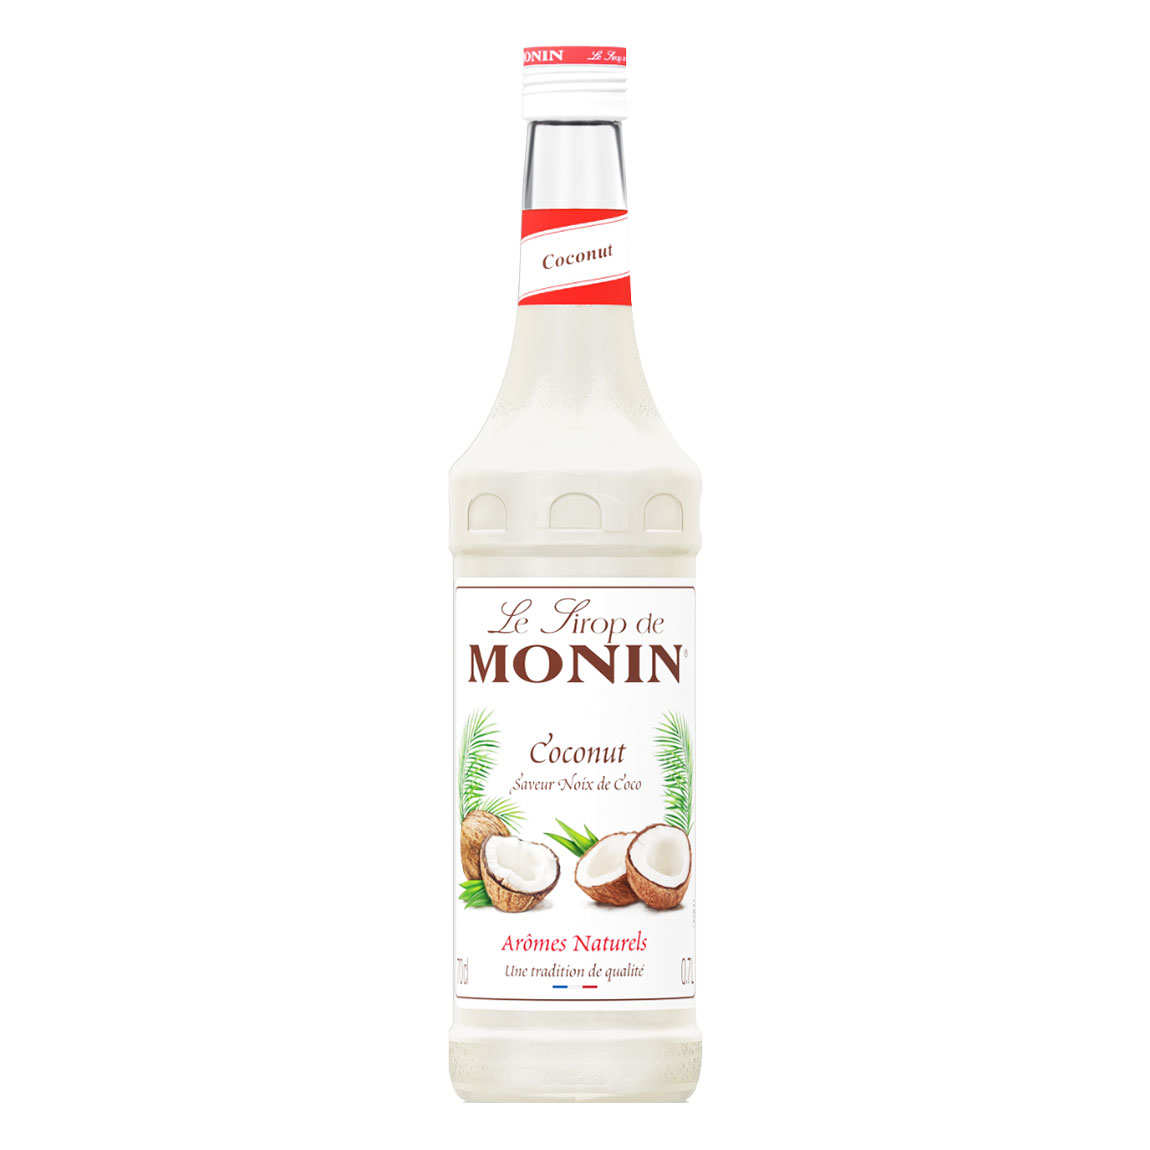 Coconut syrup - Monin